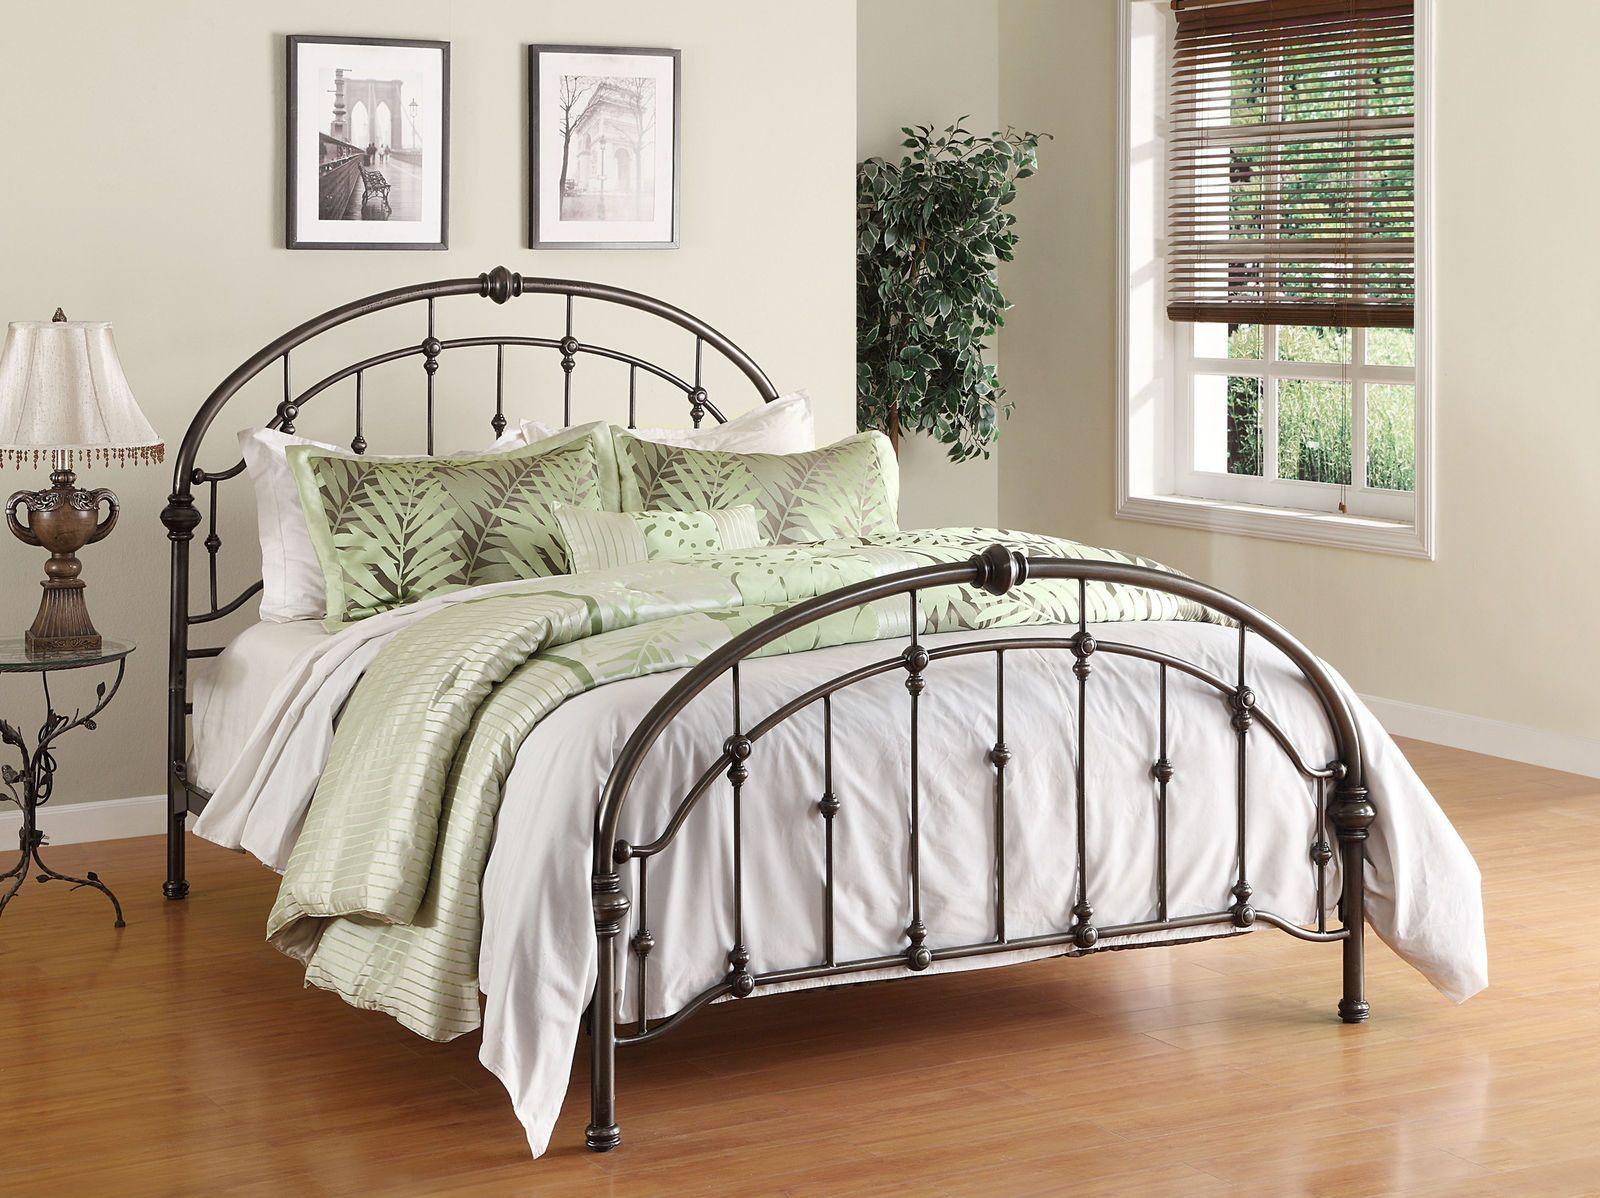 Details about Alcott Hill Homestead Queen Standard Bed